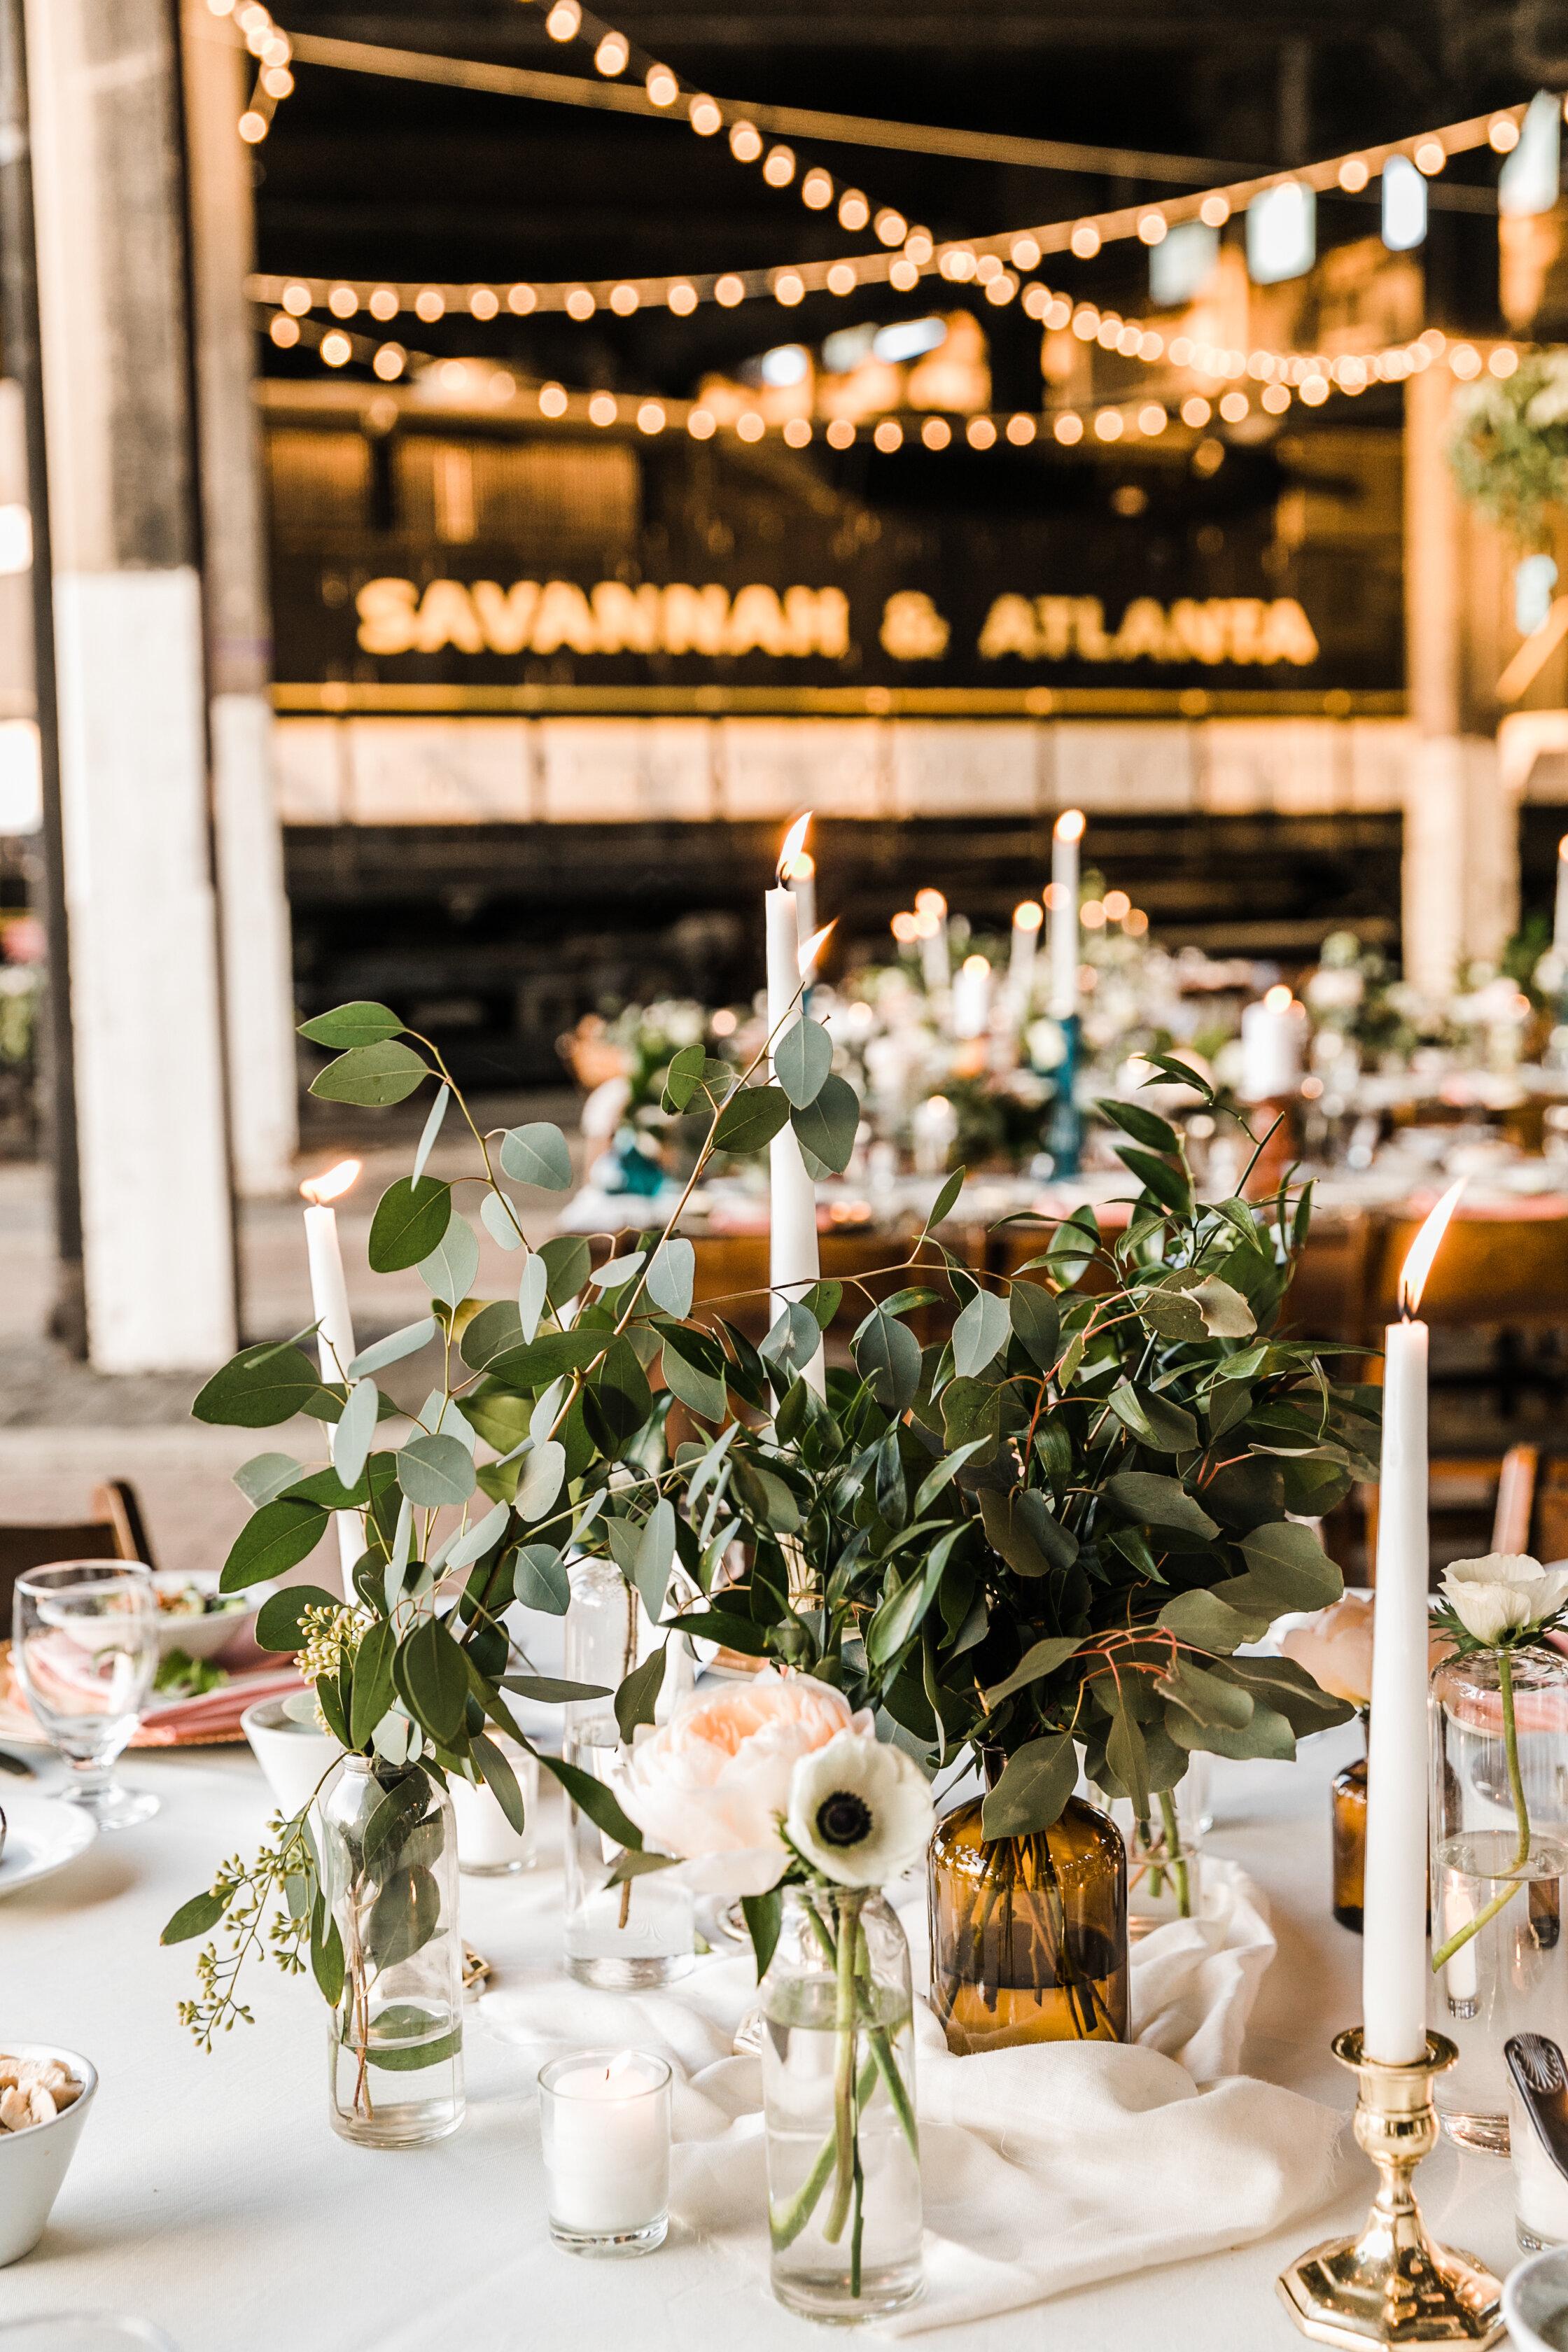 ivory-and-beau-blog-weddings-ivory-and-beau-couple-dominique-and-andres-savannah-florist-wedding-planning-savannah-bridal-boutique-wedding-flowers-KIP_WEBERWEDDING_RAILROADMUSEUM-1343.JPG